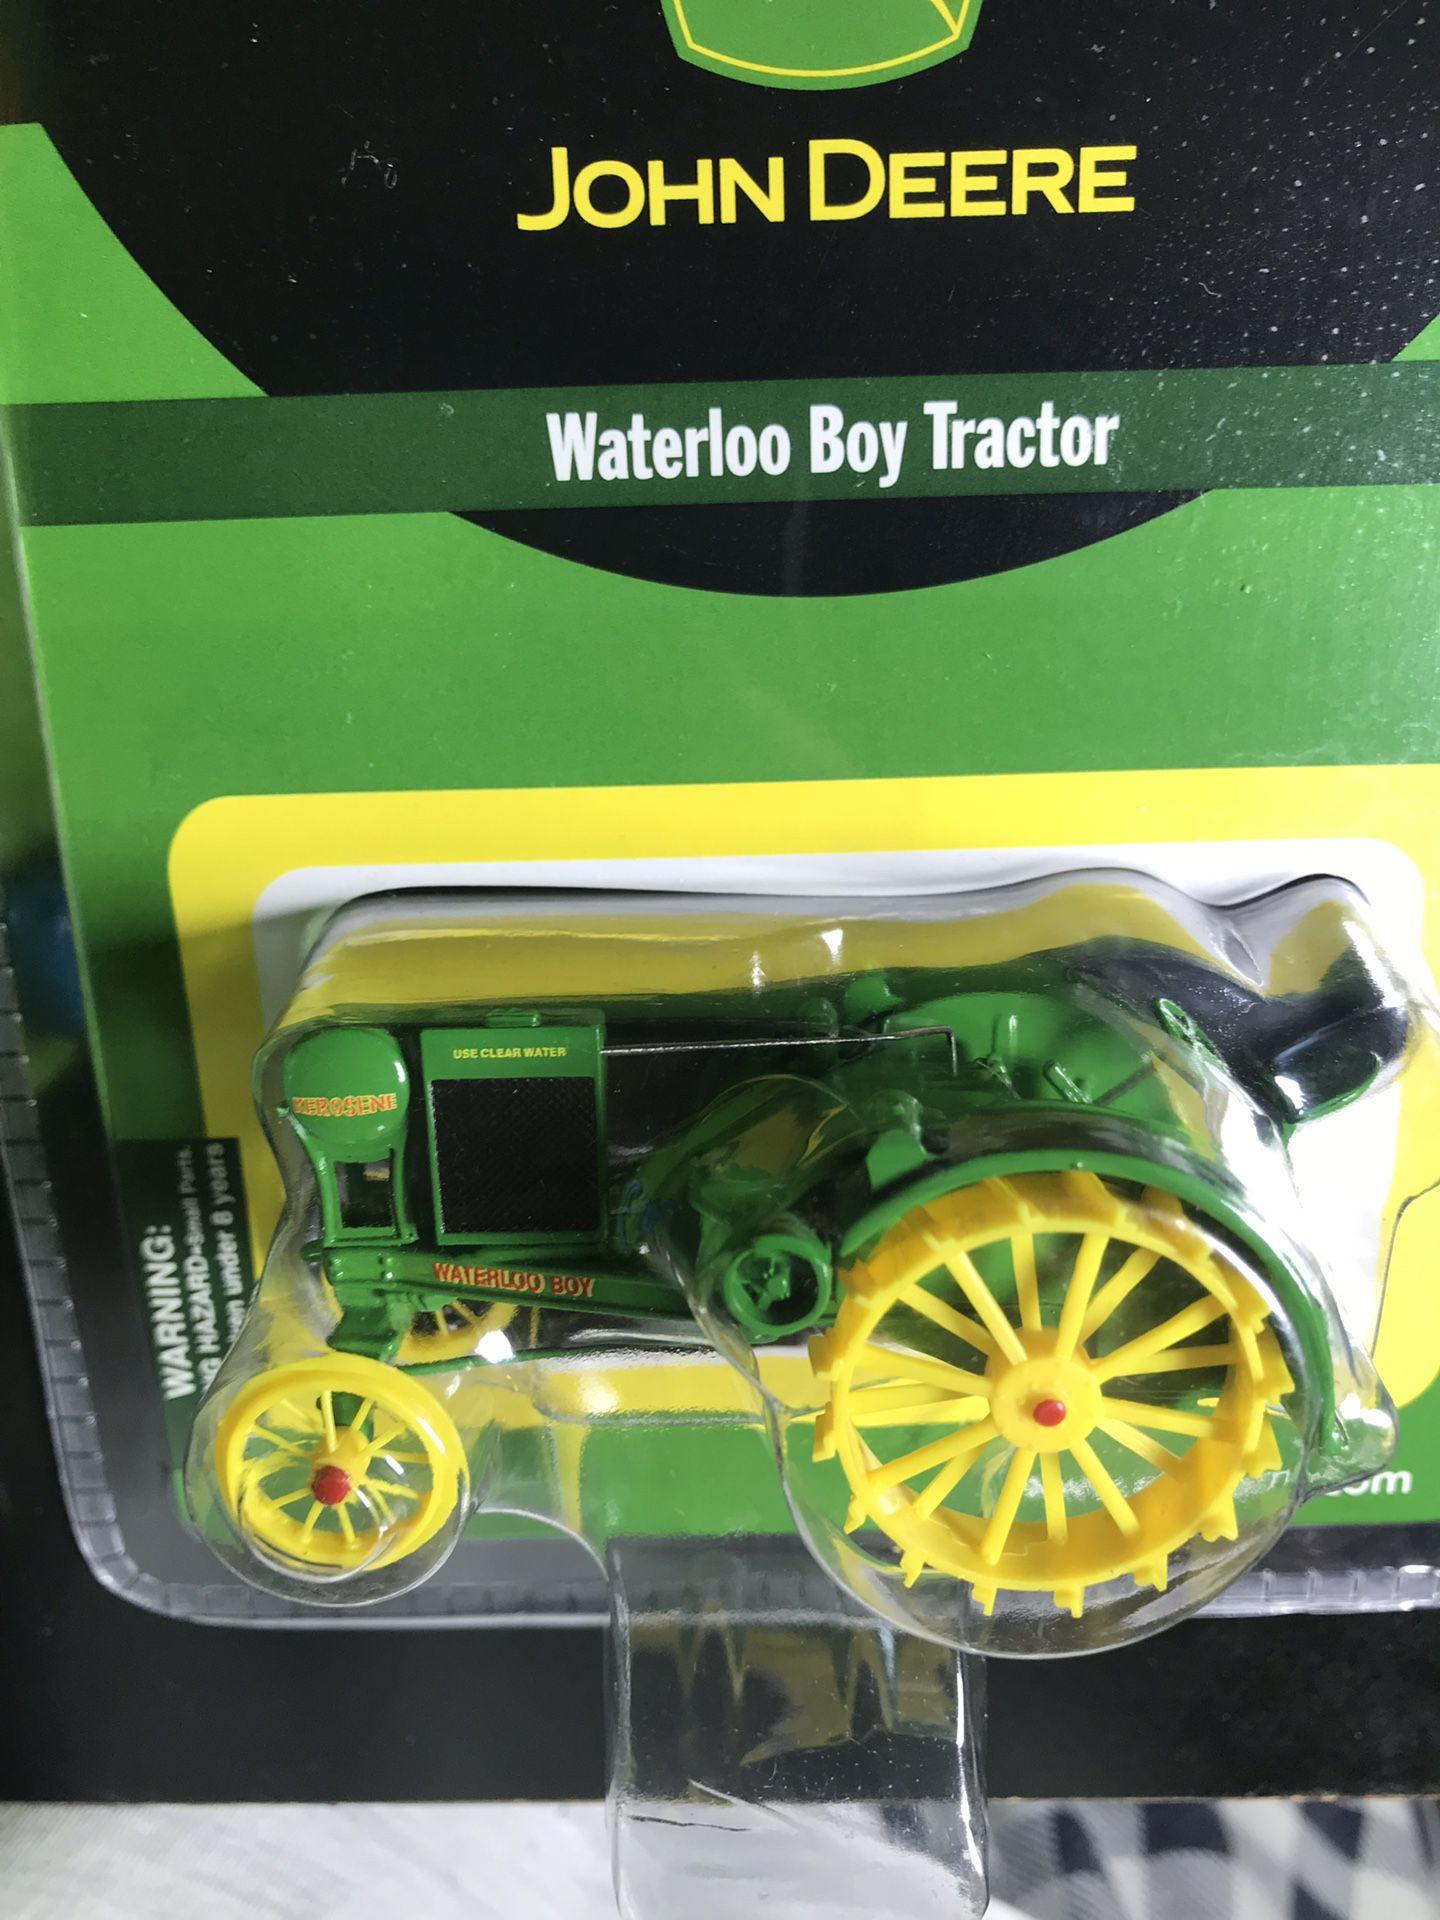 Athearns John Deere-Waterloo Boy Tractor-Model B Tractor-GP Tractor-1:50 Scale